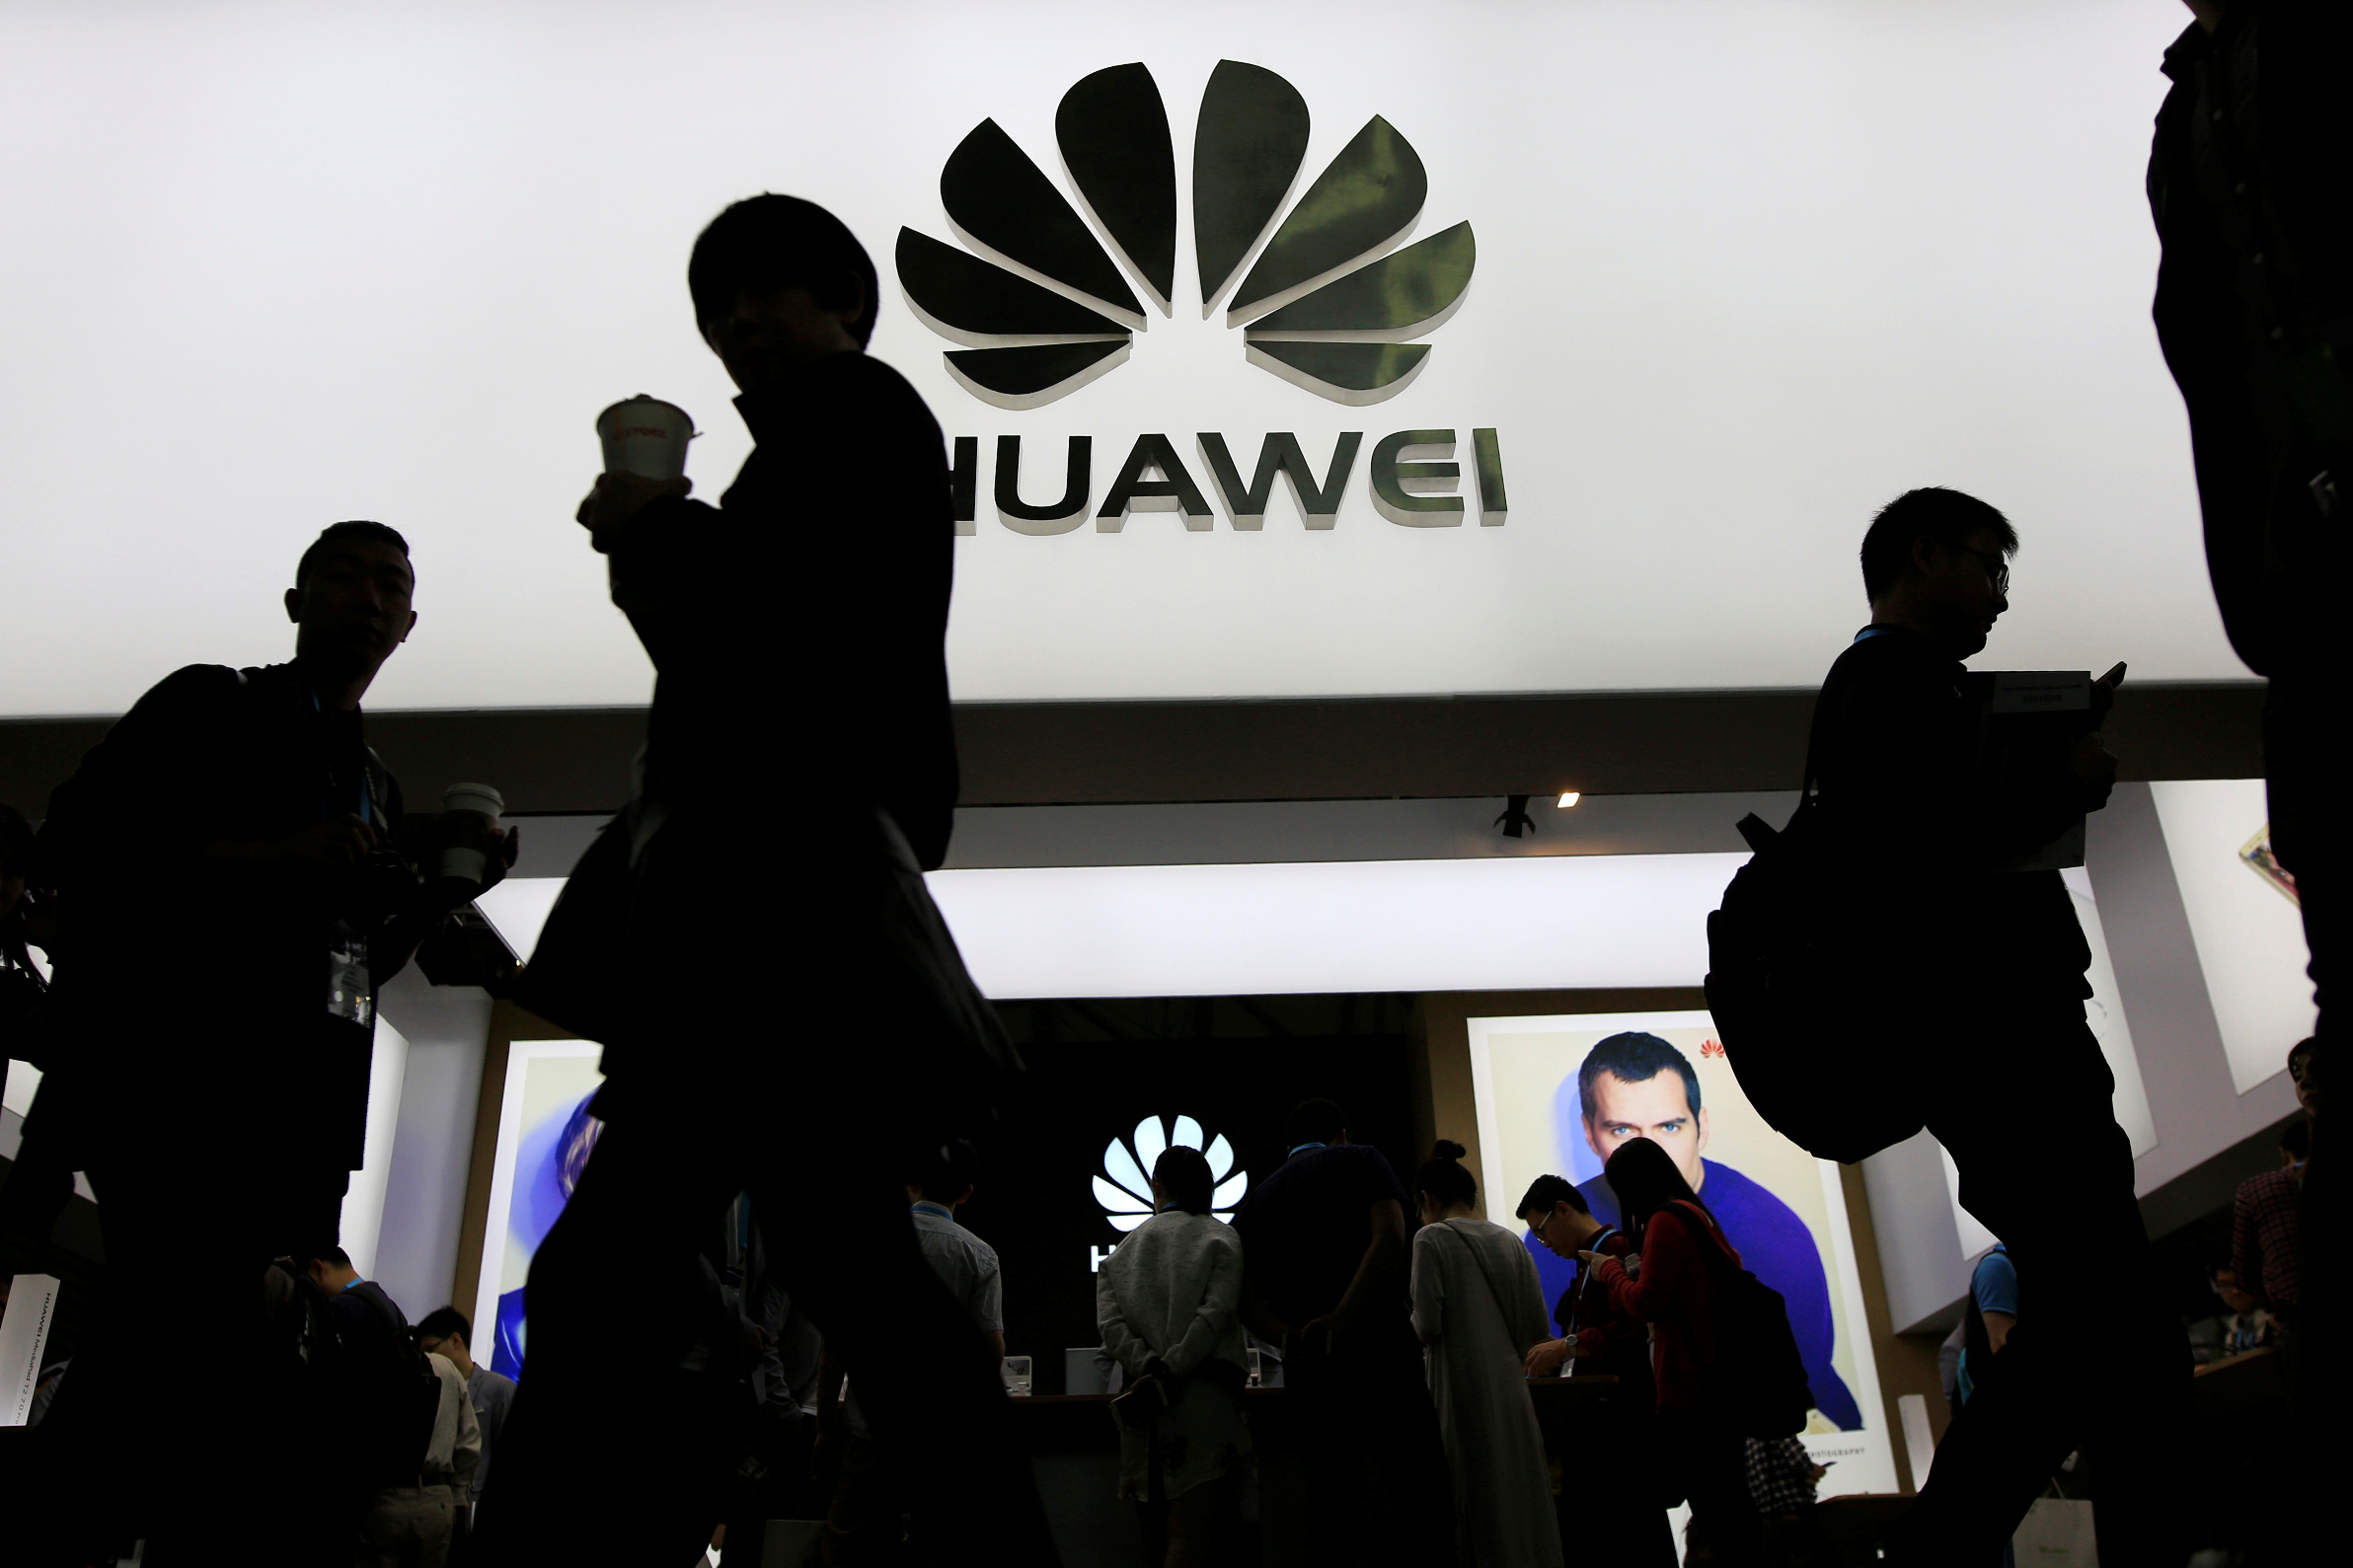 Huaweijev dućan, ilustracija